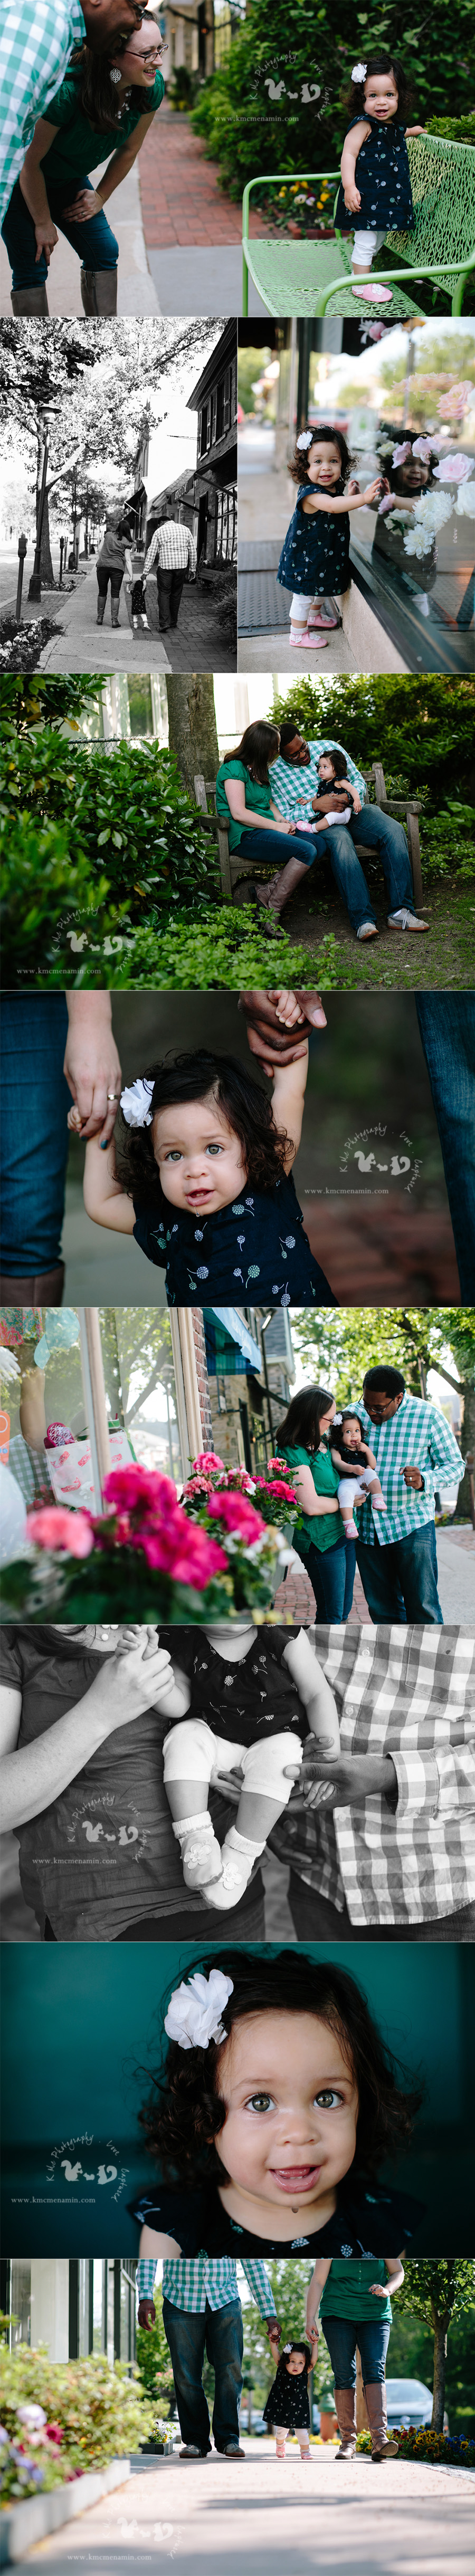 Chestnut_Hill_Family_Photographer_1